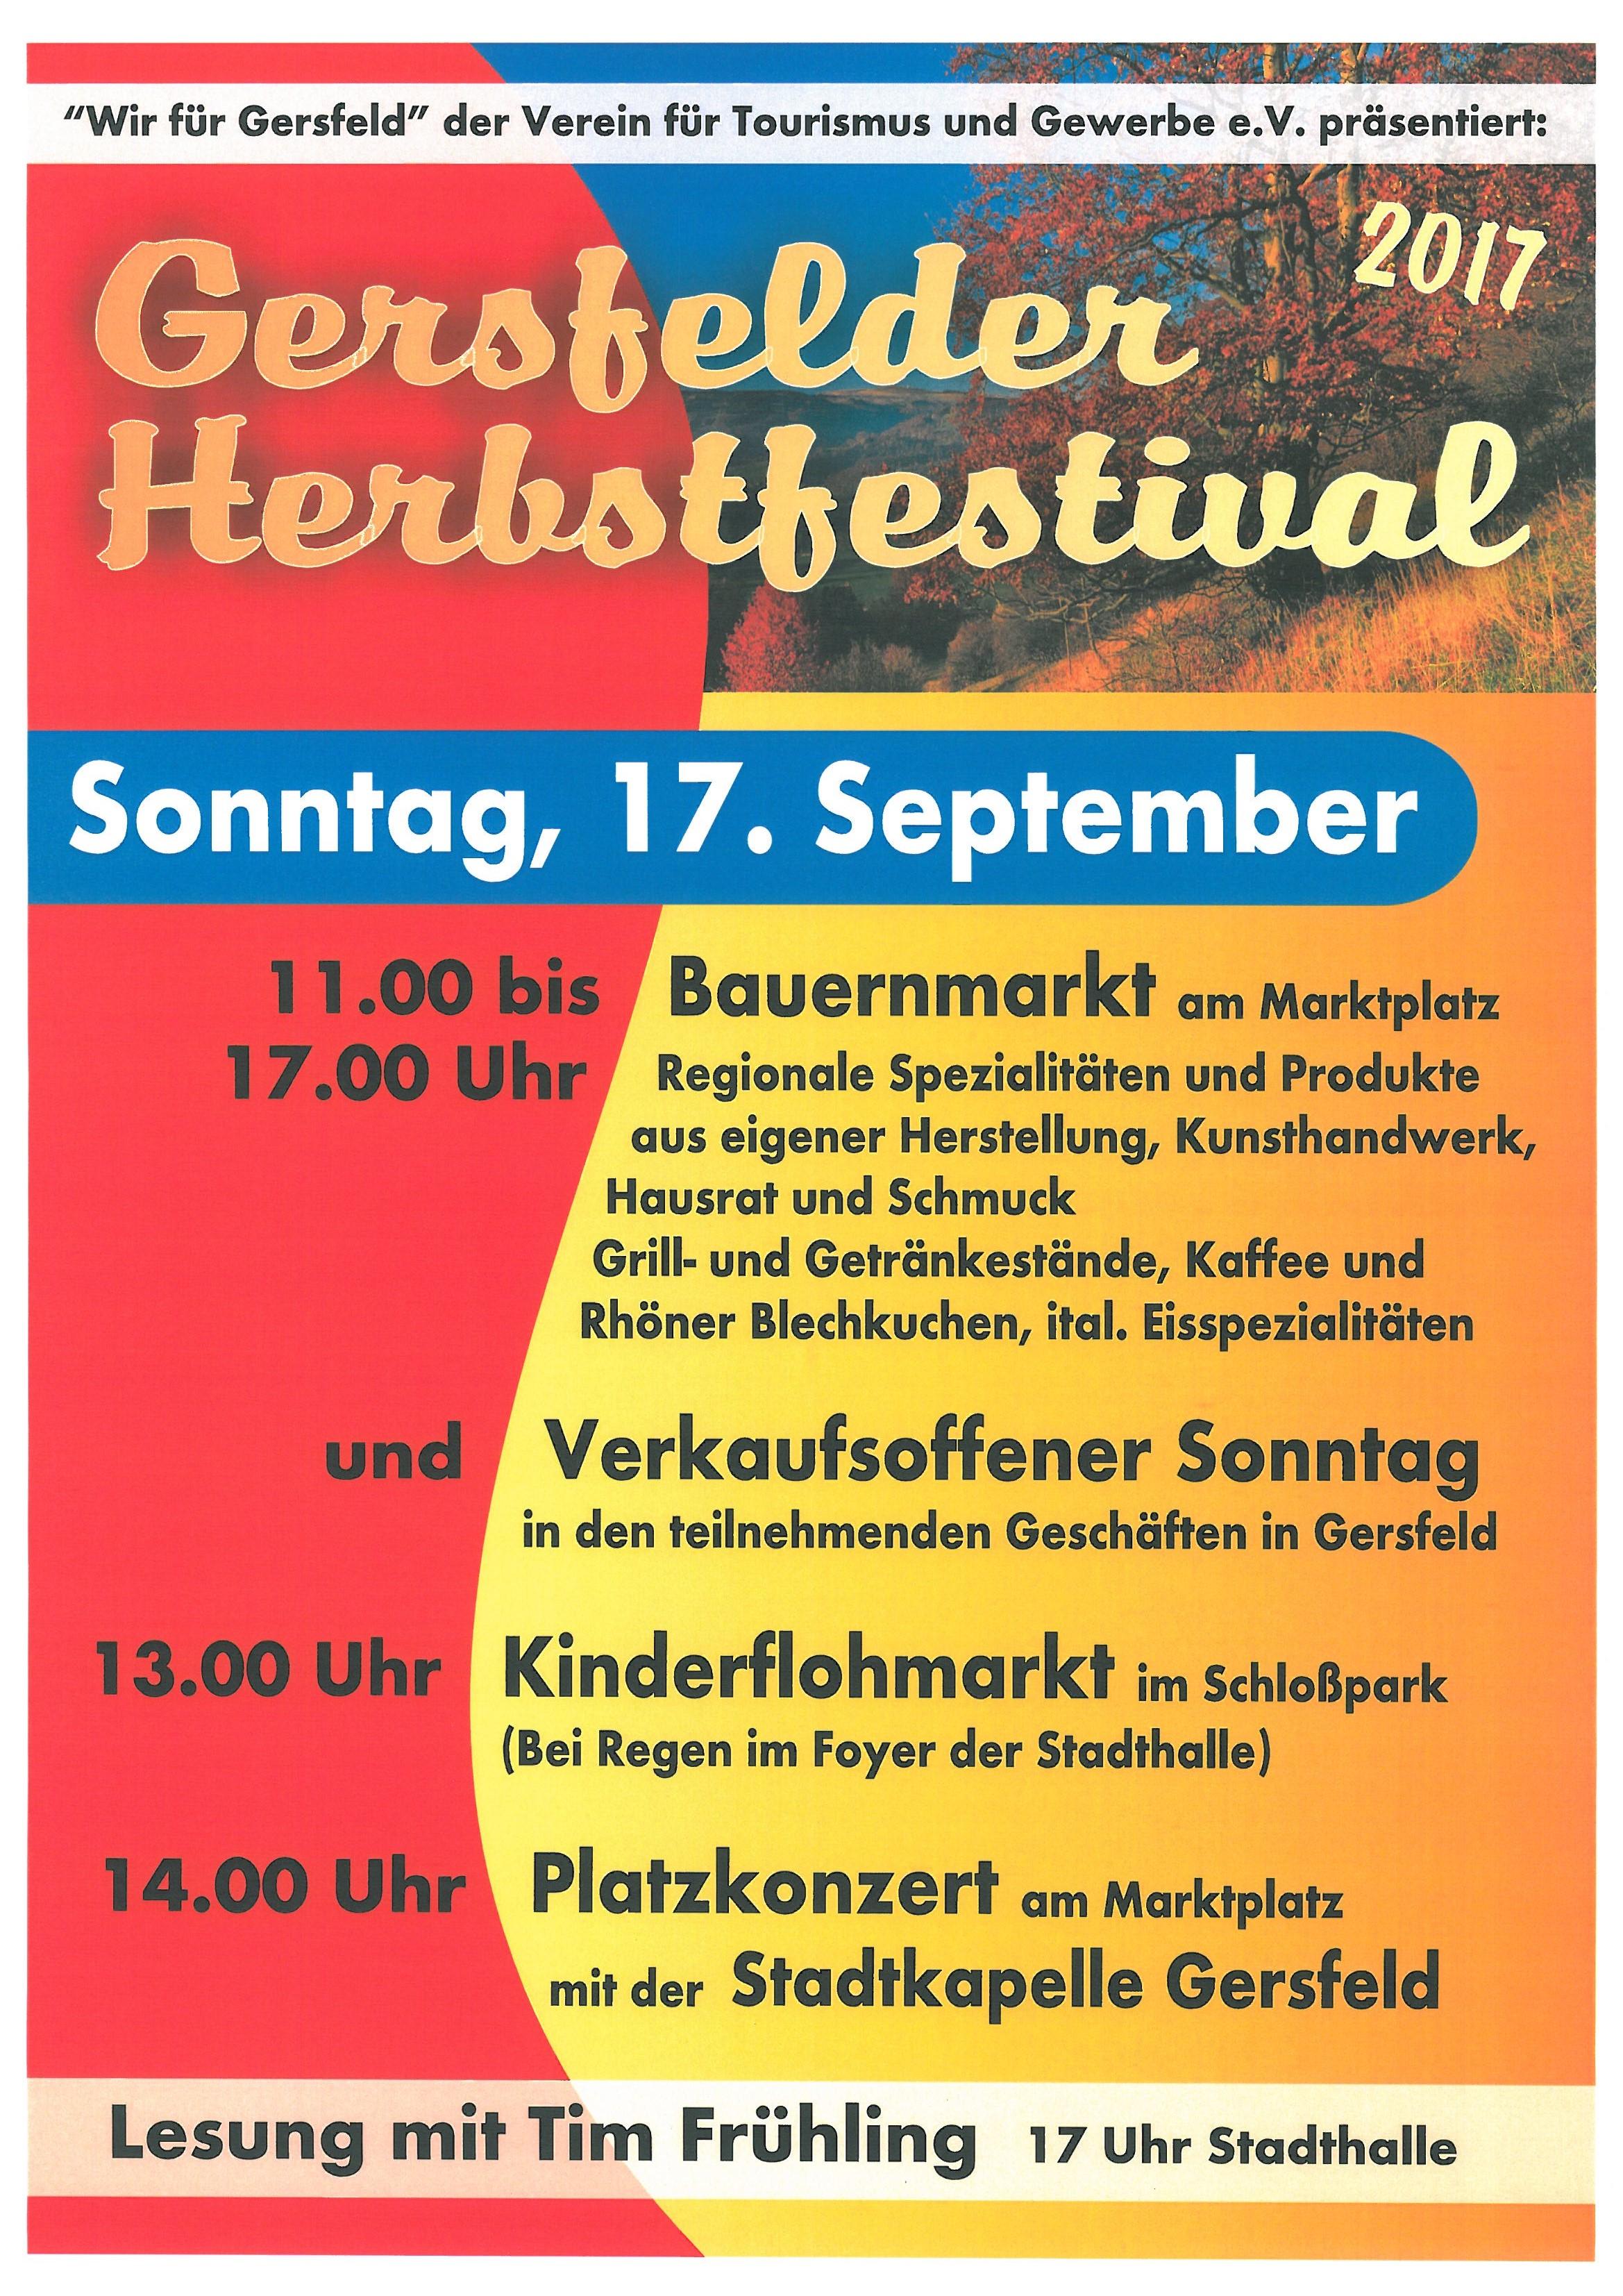 Bauernmarkt Herbstfestival & verkaufsoffener Sonntag am 17. September